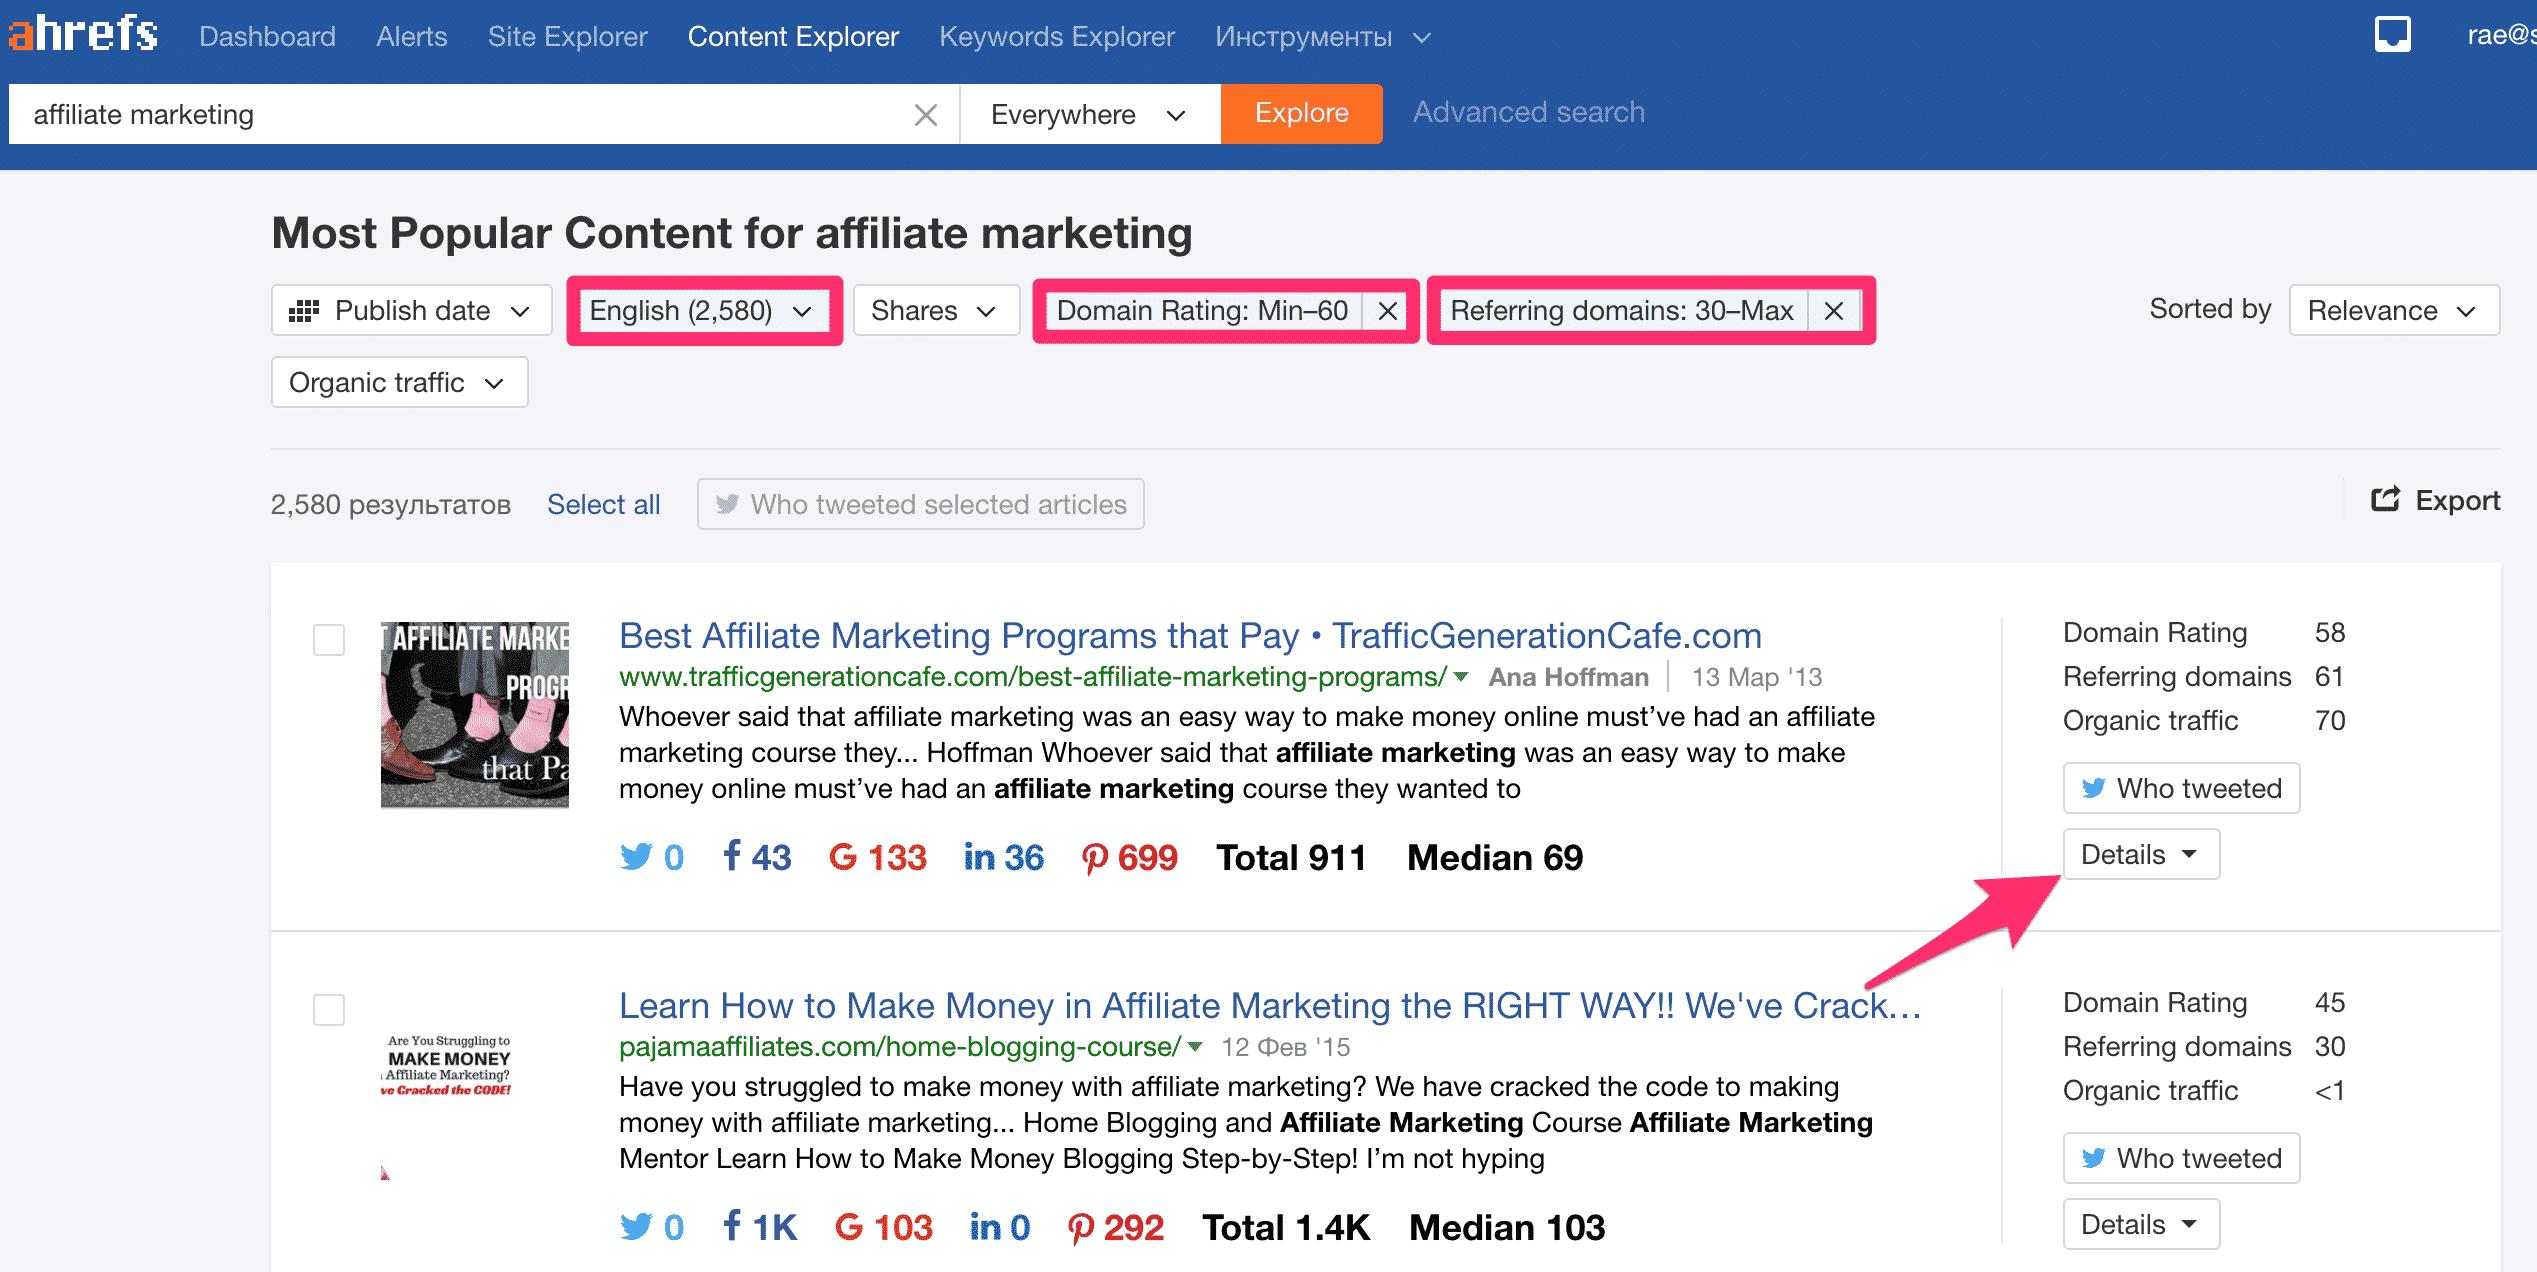 ahrefs content explorer results